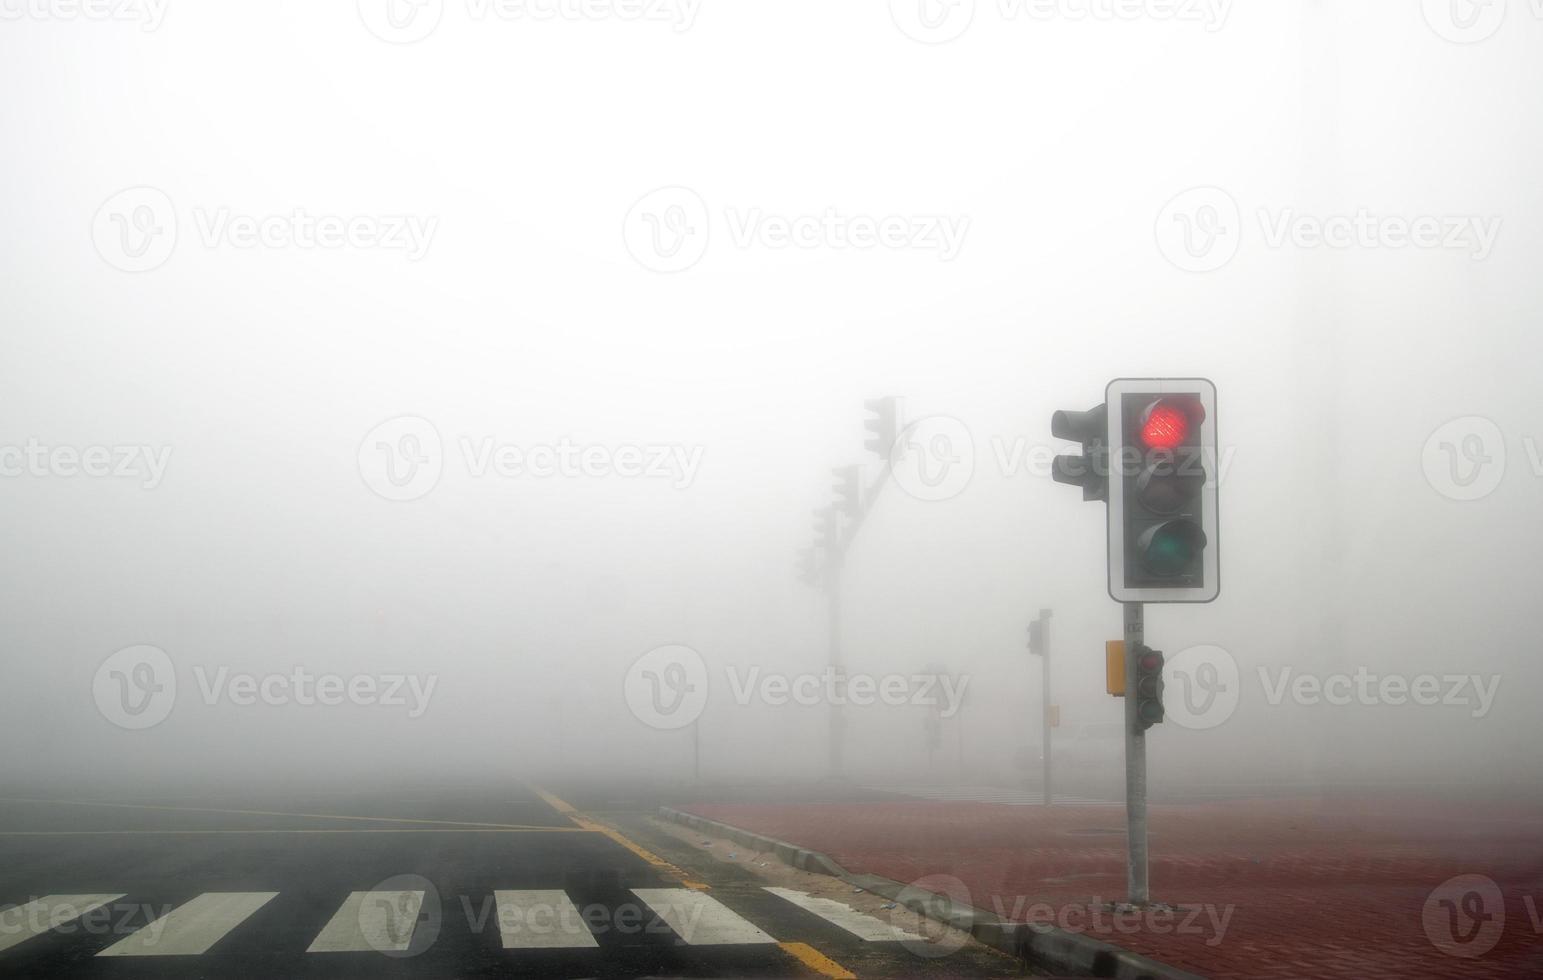 niebla en la carretera de dubai. la señal roja está encendida. foto